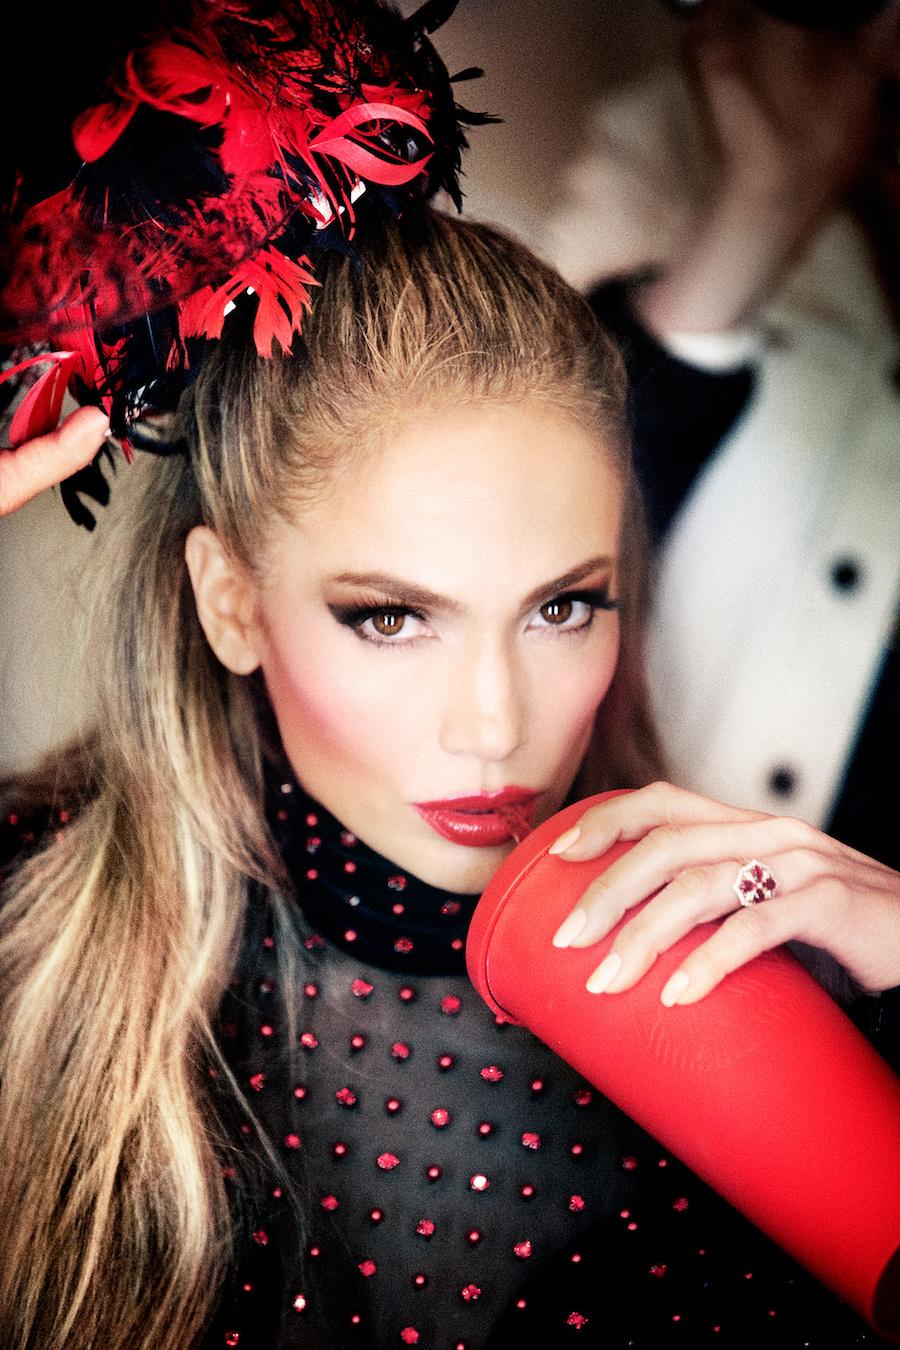 Jennifer-Lopez-Sexy-10-thefappeningblog.com_-1.jpg